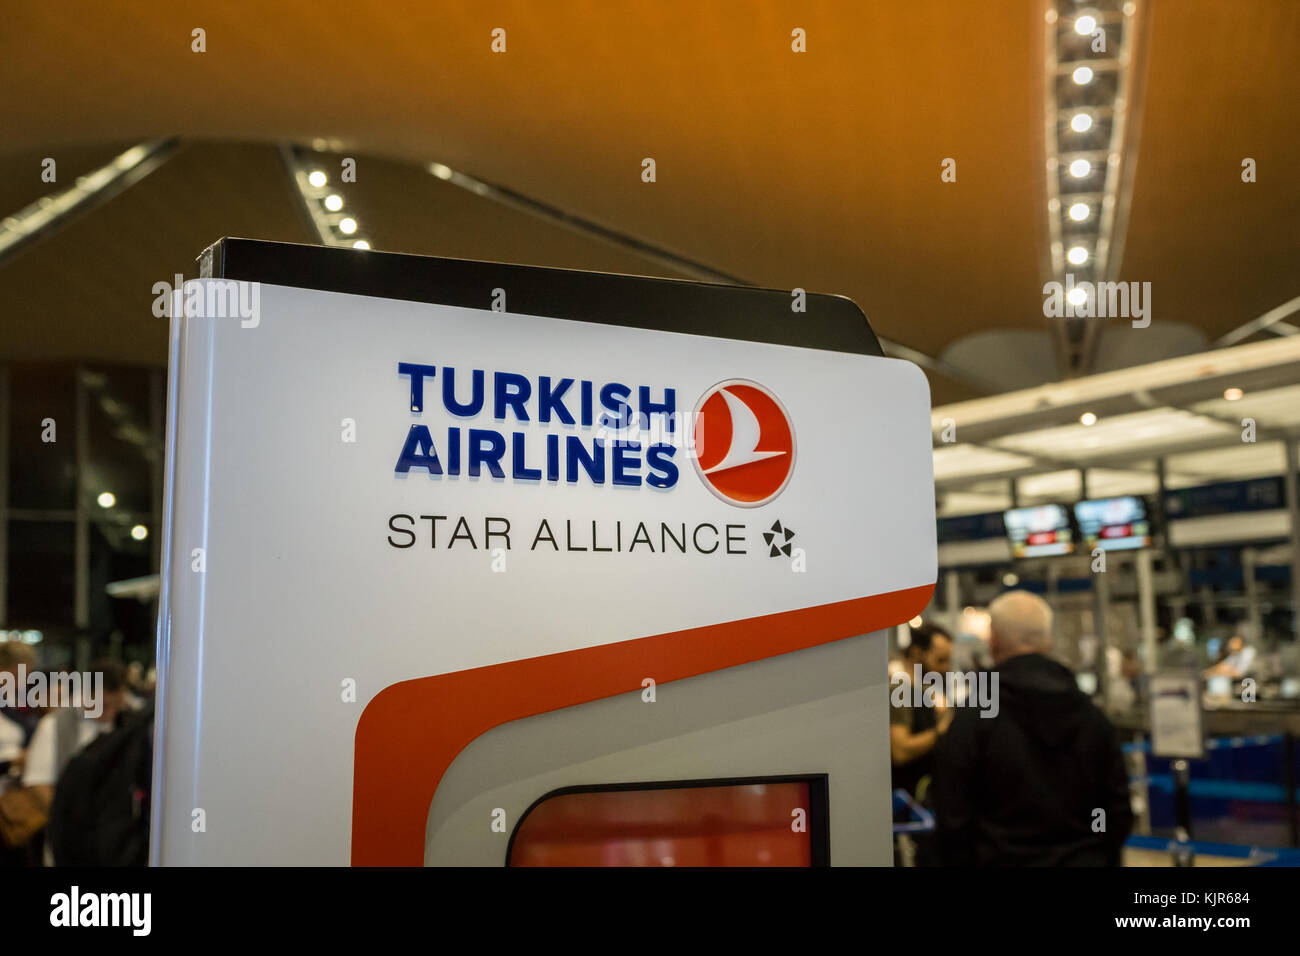 Kuala Lumpur, Malaysia -November 2017: Turkish Airlines check-in counter at Kuala Lumpur International Airport. - Stock Image